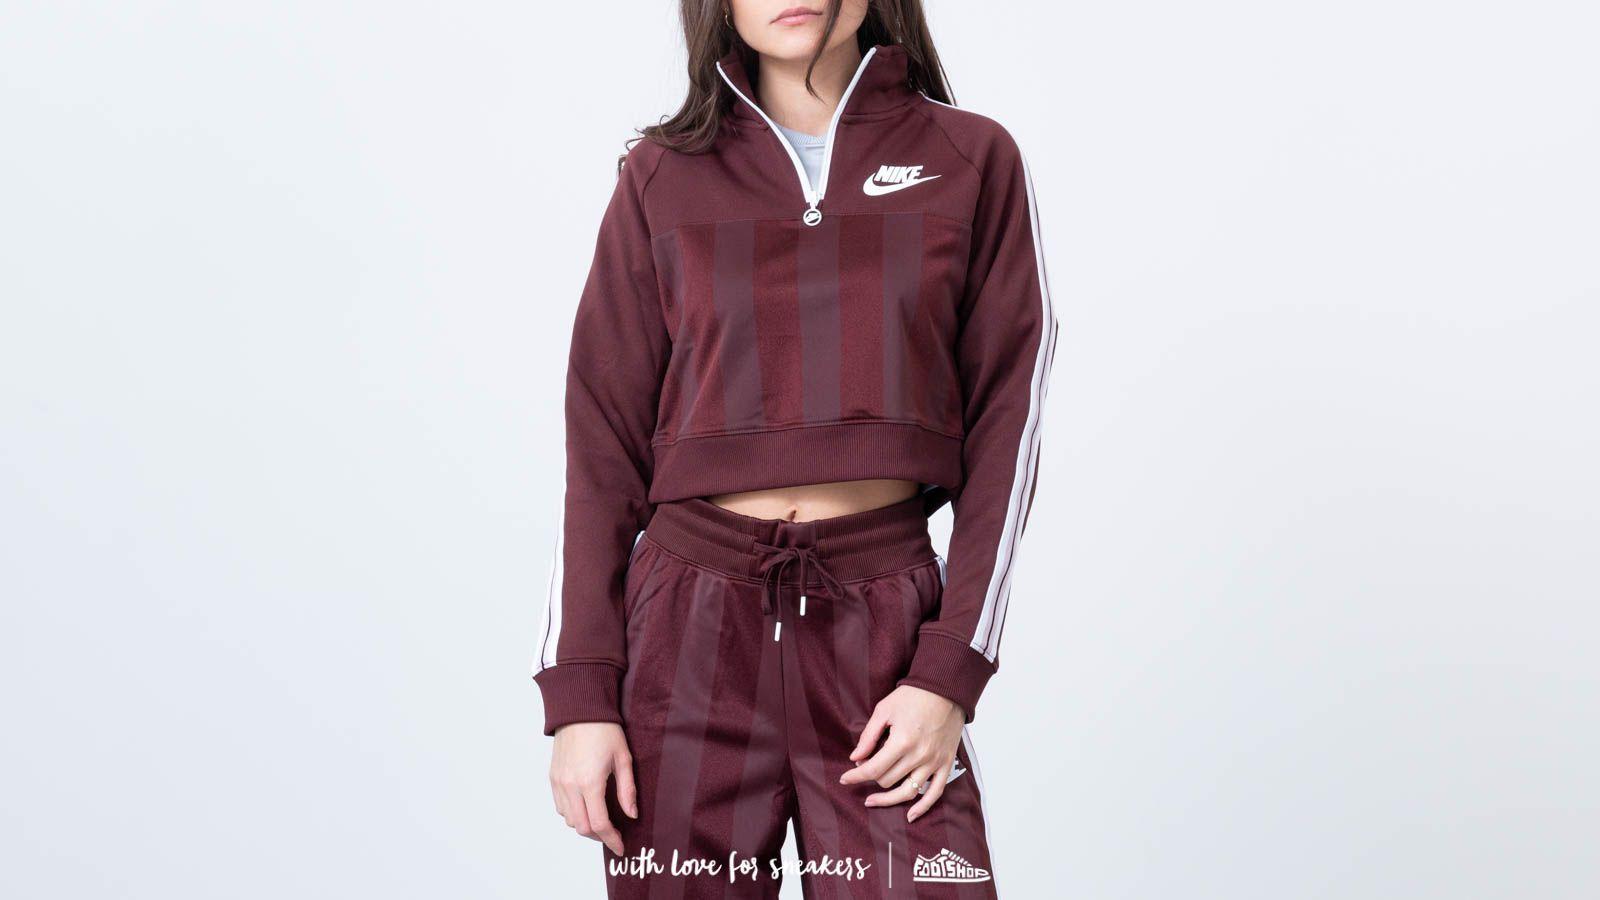 Nike Wmns Long Sleeve Top